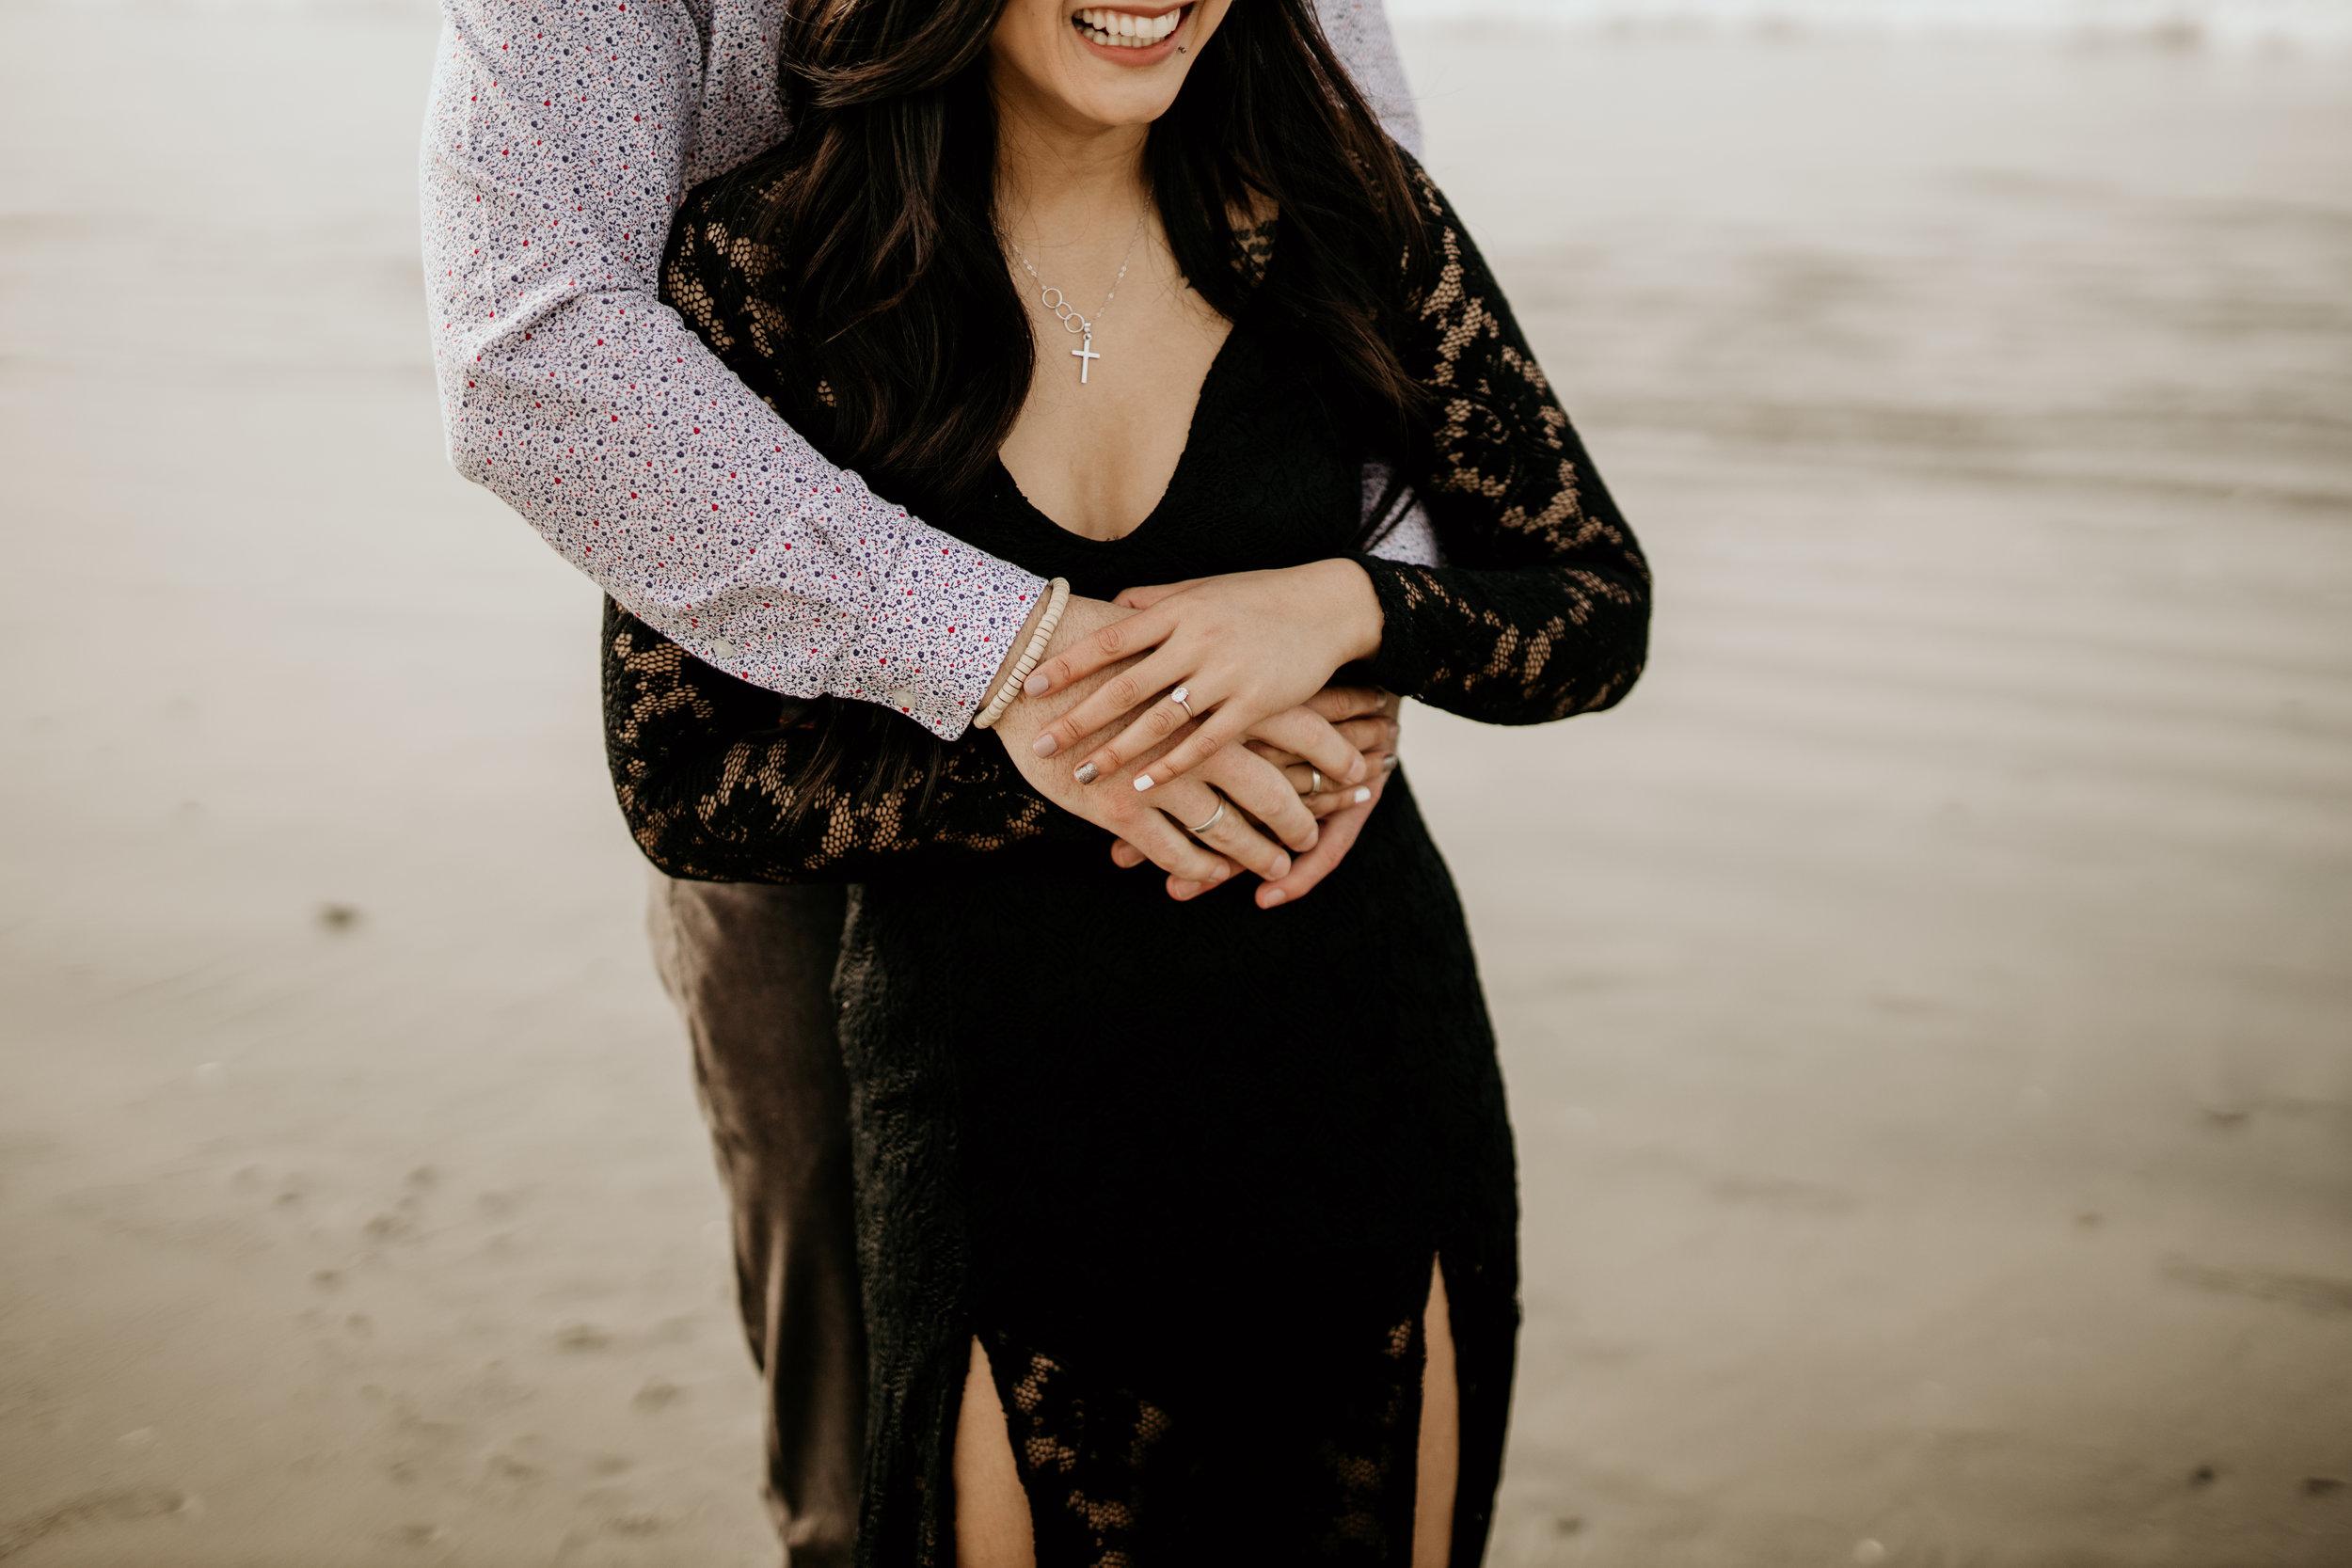 beach-couples-engagement-photoshoot-7430.jpg